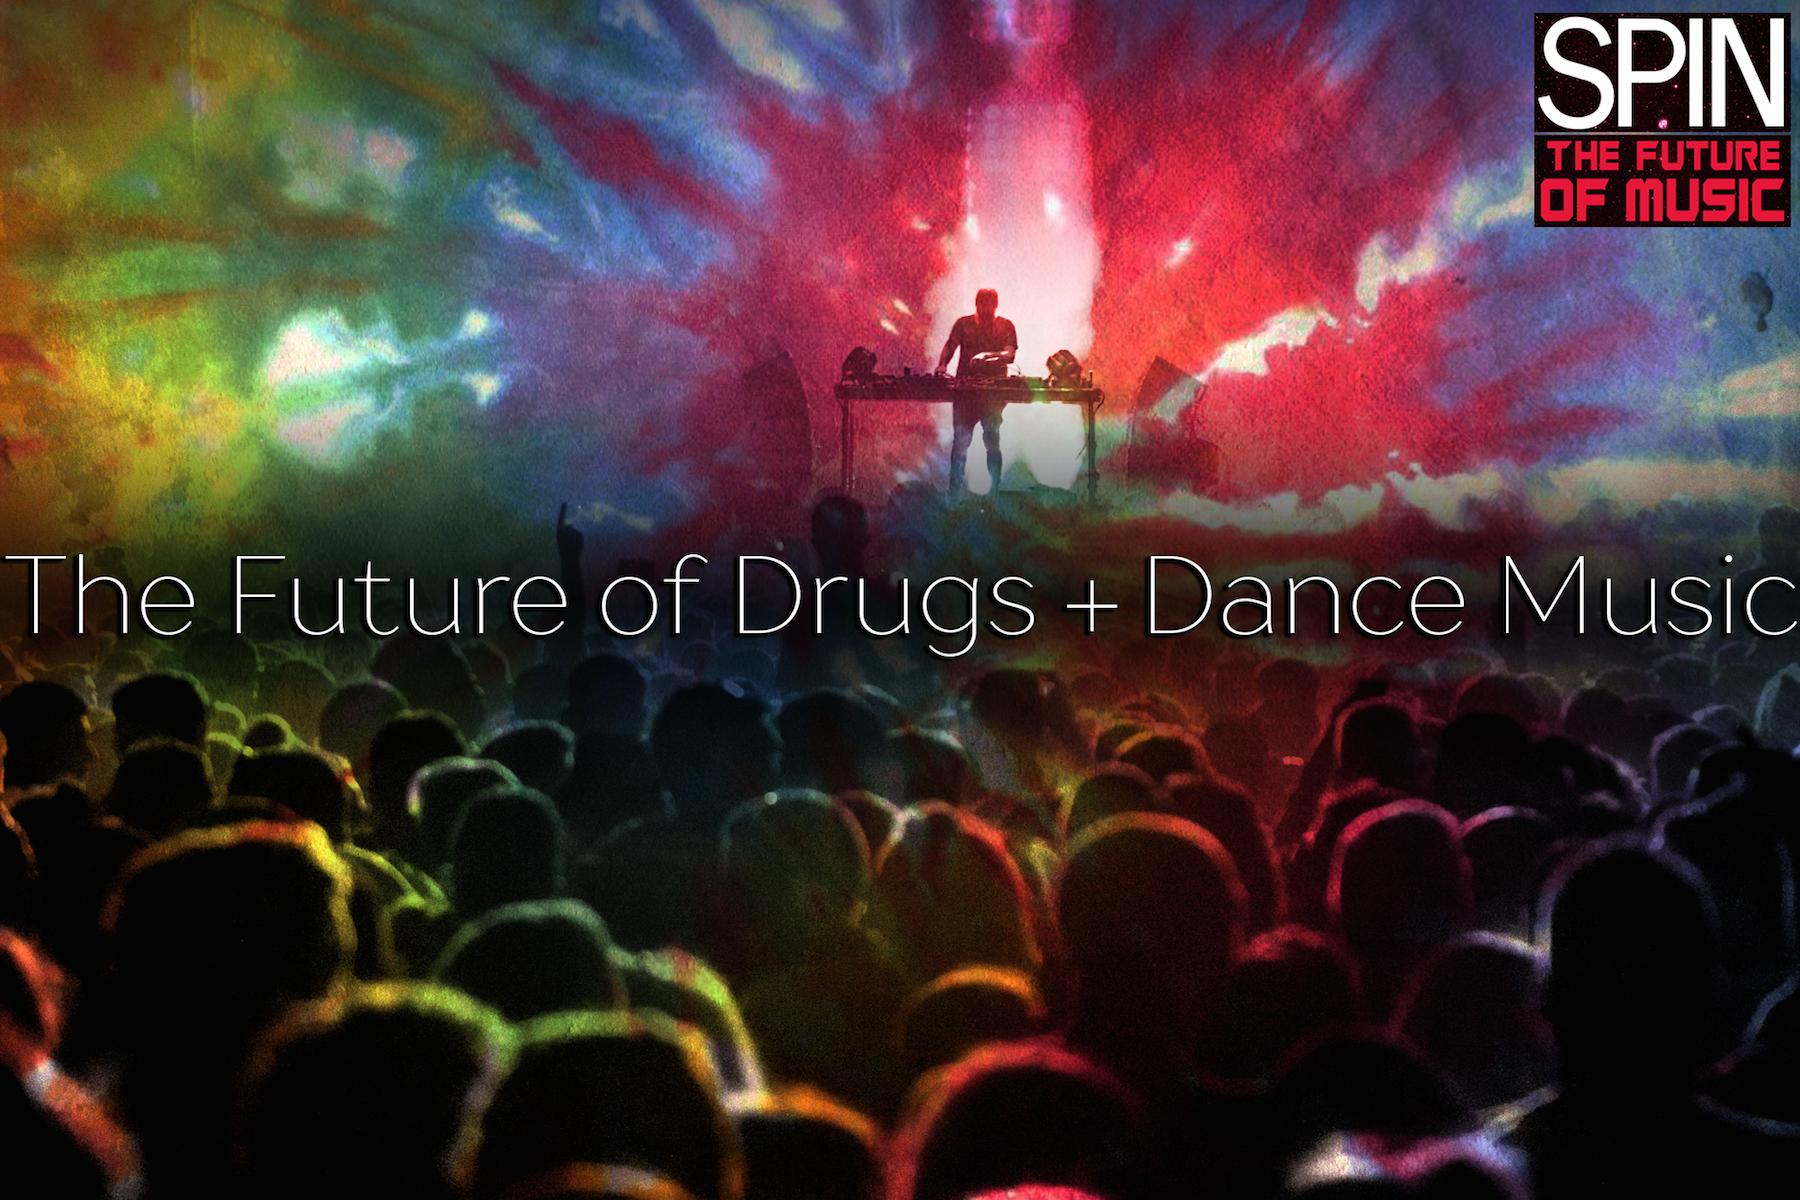 Ecstasy, Fake LSD, and Sort-Of Magic Mushrooms: The Future of Dance Music's Drugs